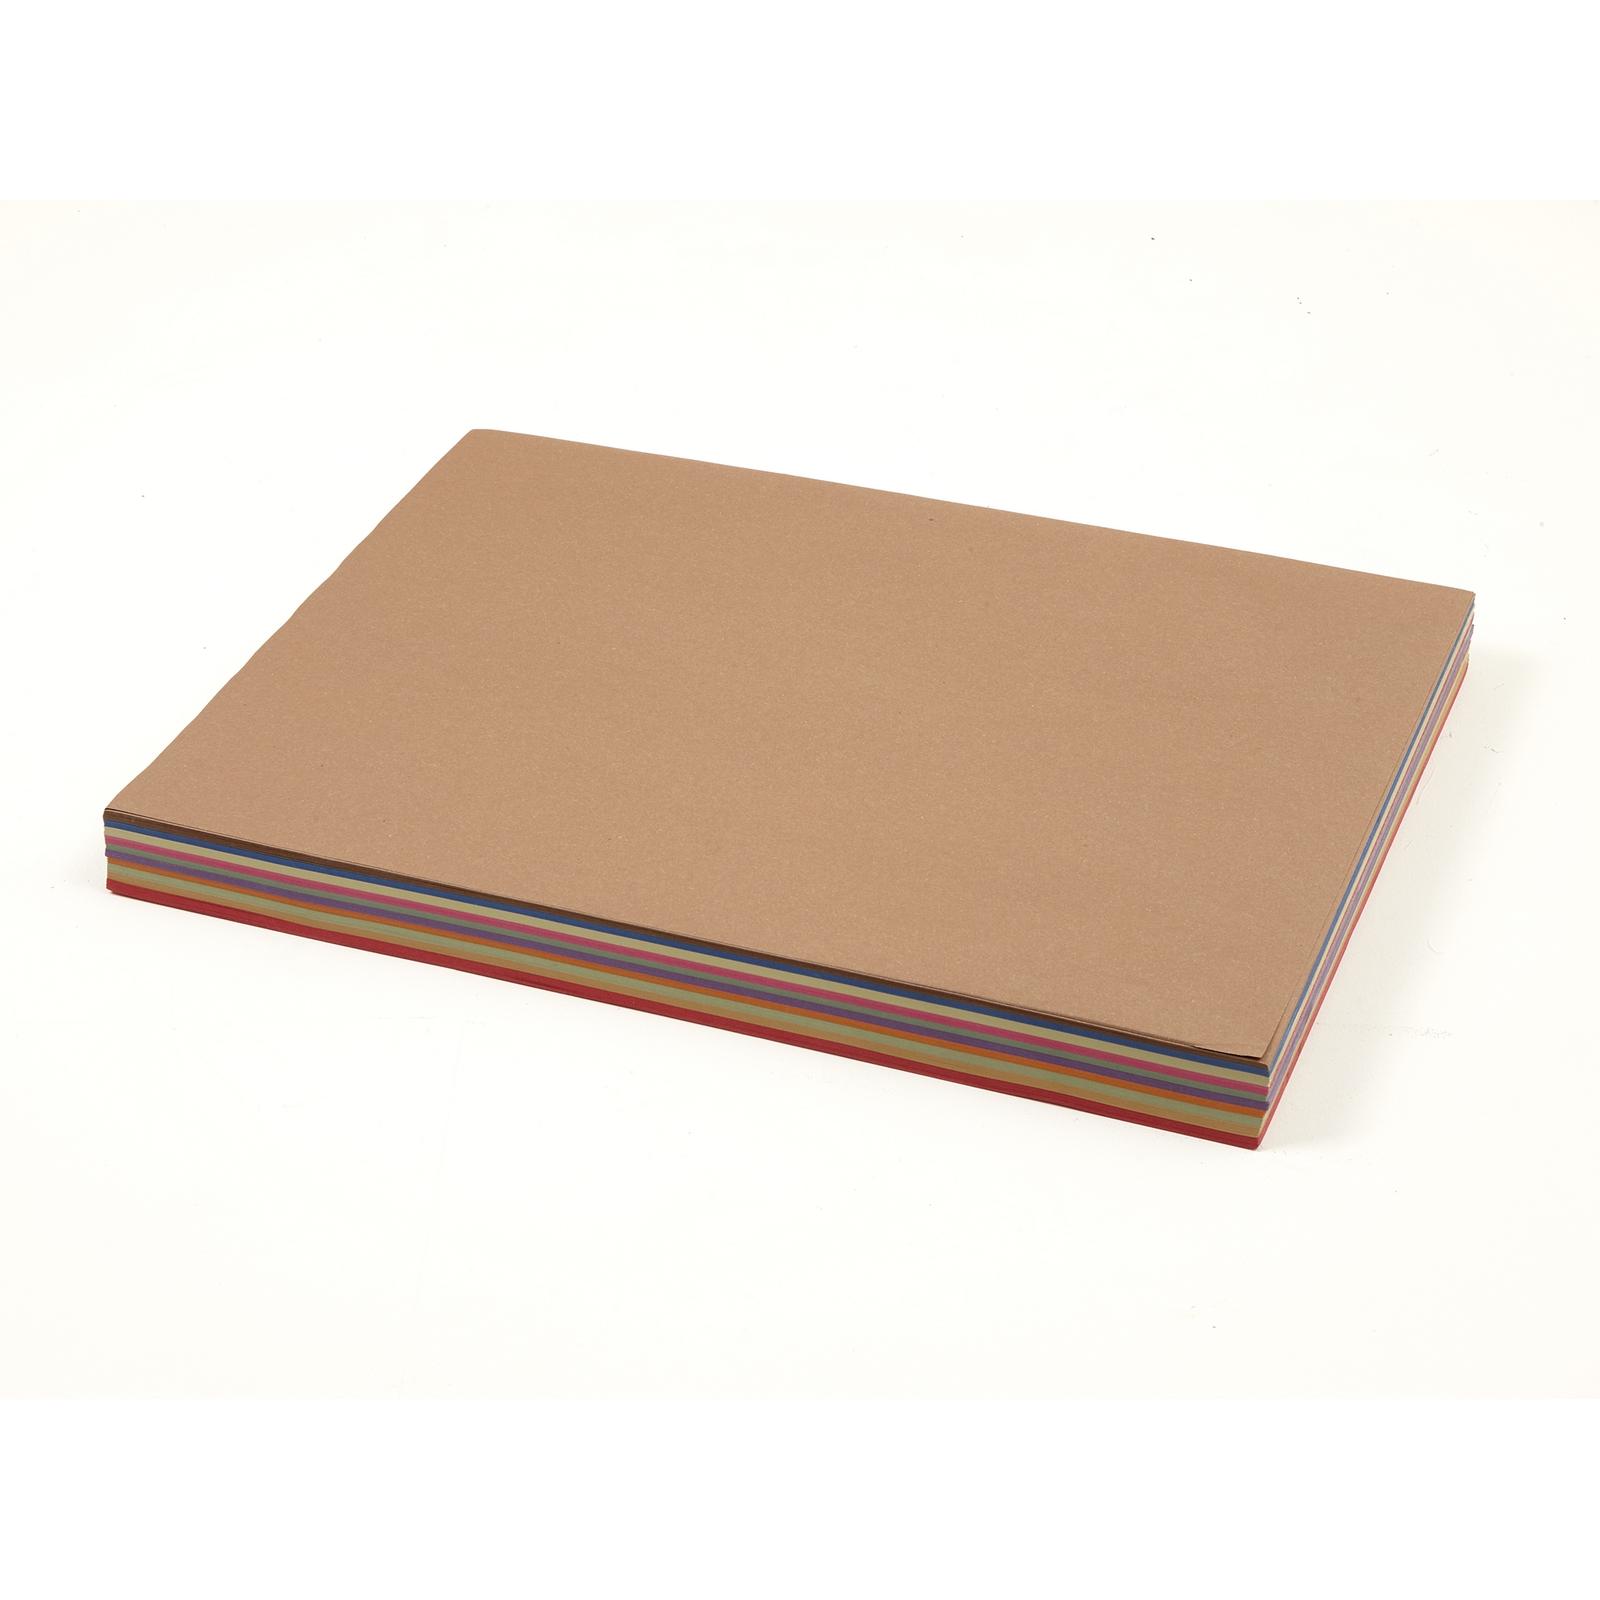 Copier/Inkjet/Laser - Paper Other Sizes